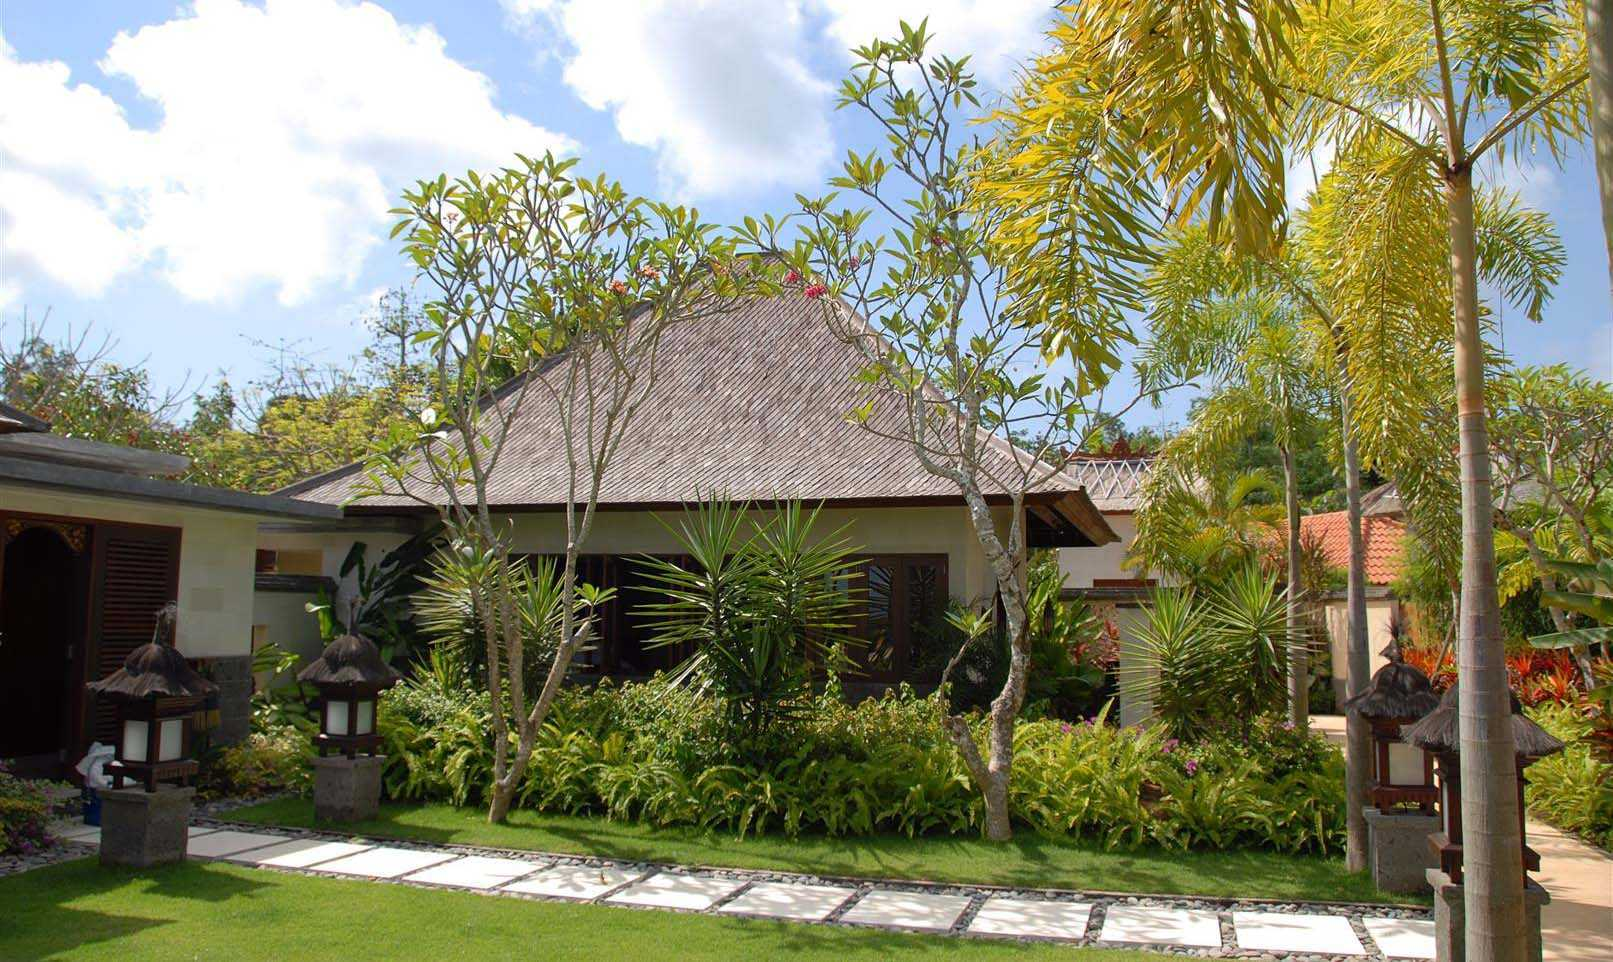 Agung Budi Raharsa Villa Indah Manis - Bali Pecatu, Bali Pecatu, Bali Bedroom Unit   12413